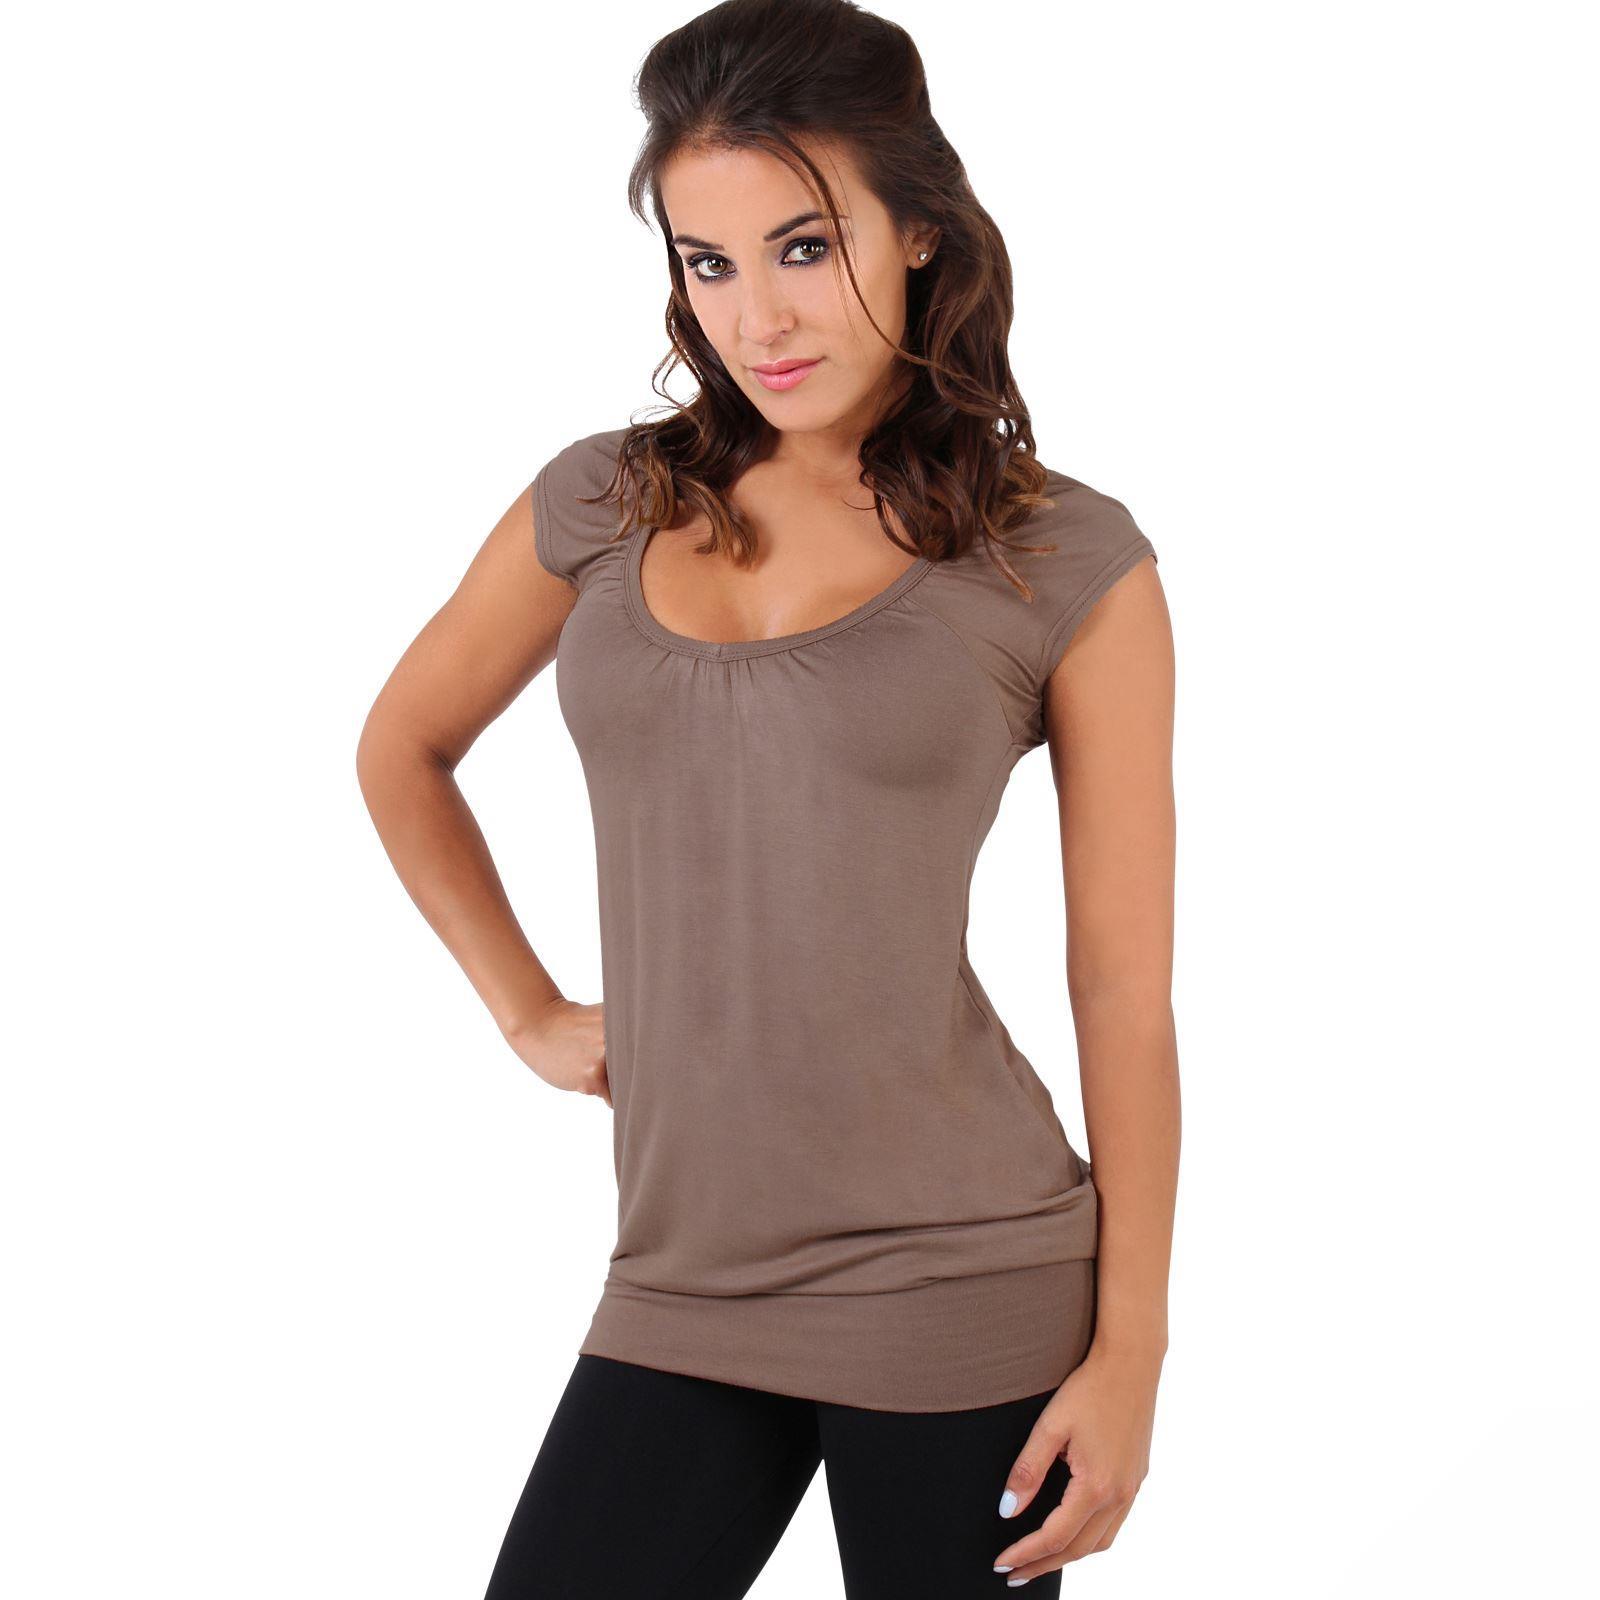 Womens-Ladies-Plain-T-Shirt-Short-Sleeve-Long-Loose-V-Neck-Blouse-Tunic-Top thumbnail 29